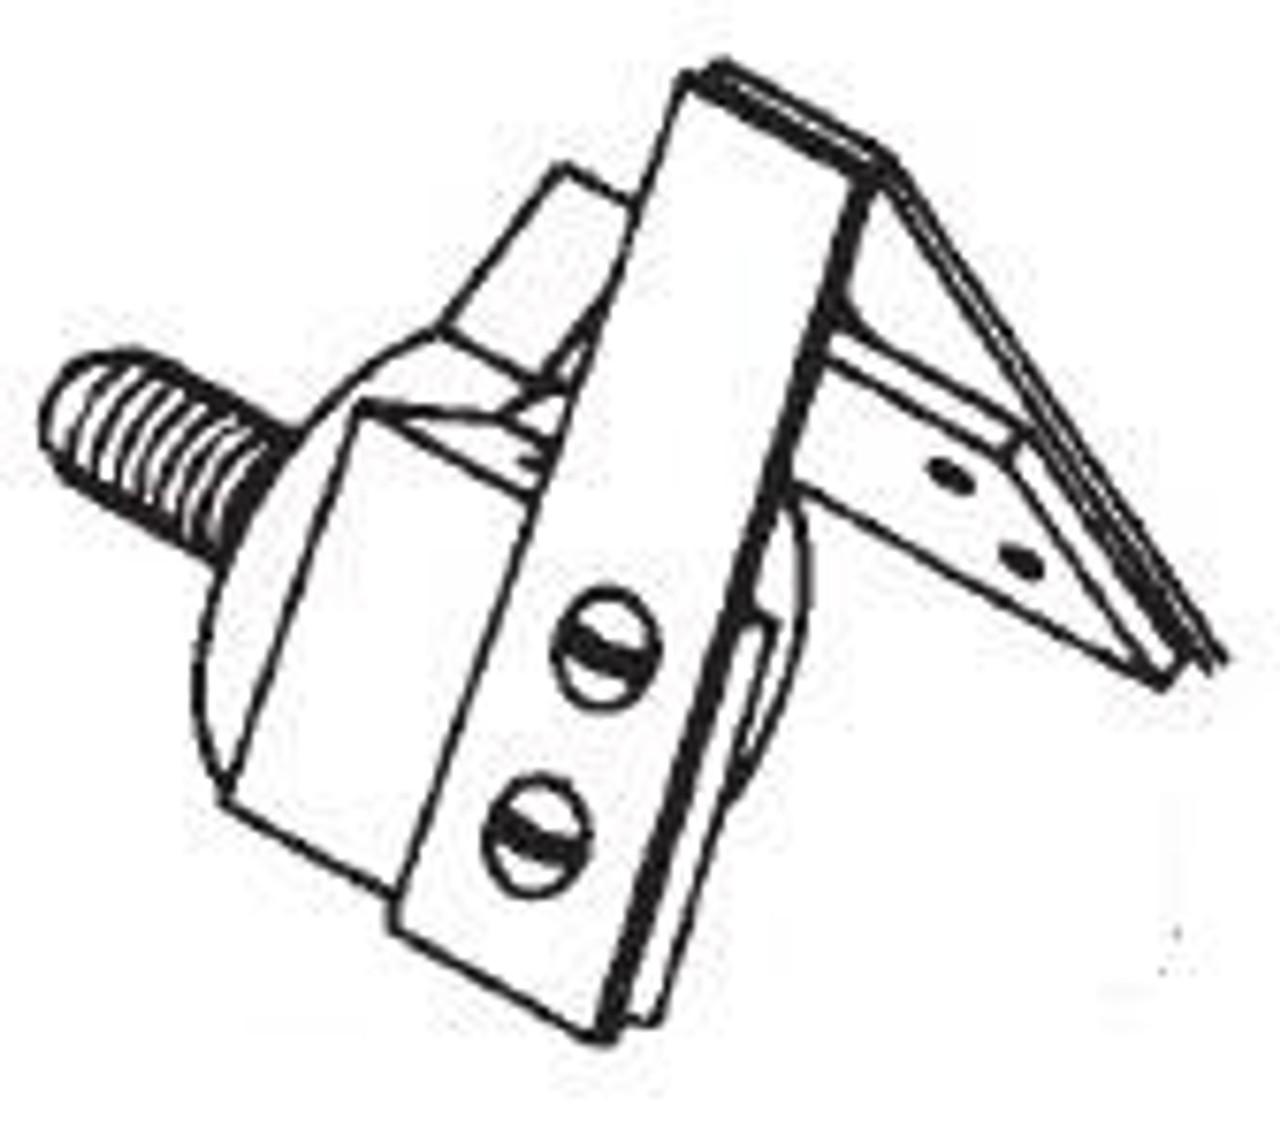 Butcher Boy B12,B14,B16,SA16, & SA20 - Blade Scraper Holder Assembly - Fiber - BB041A-66F